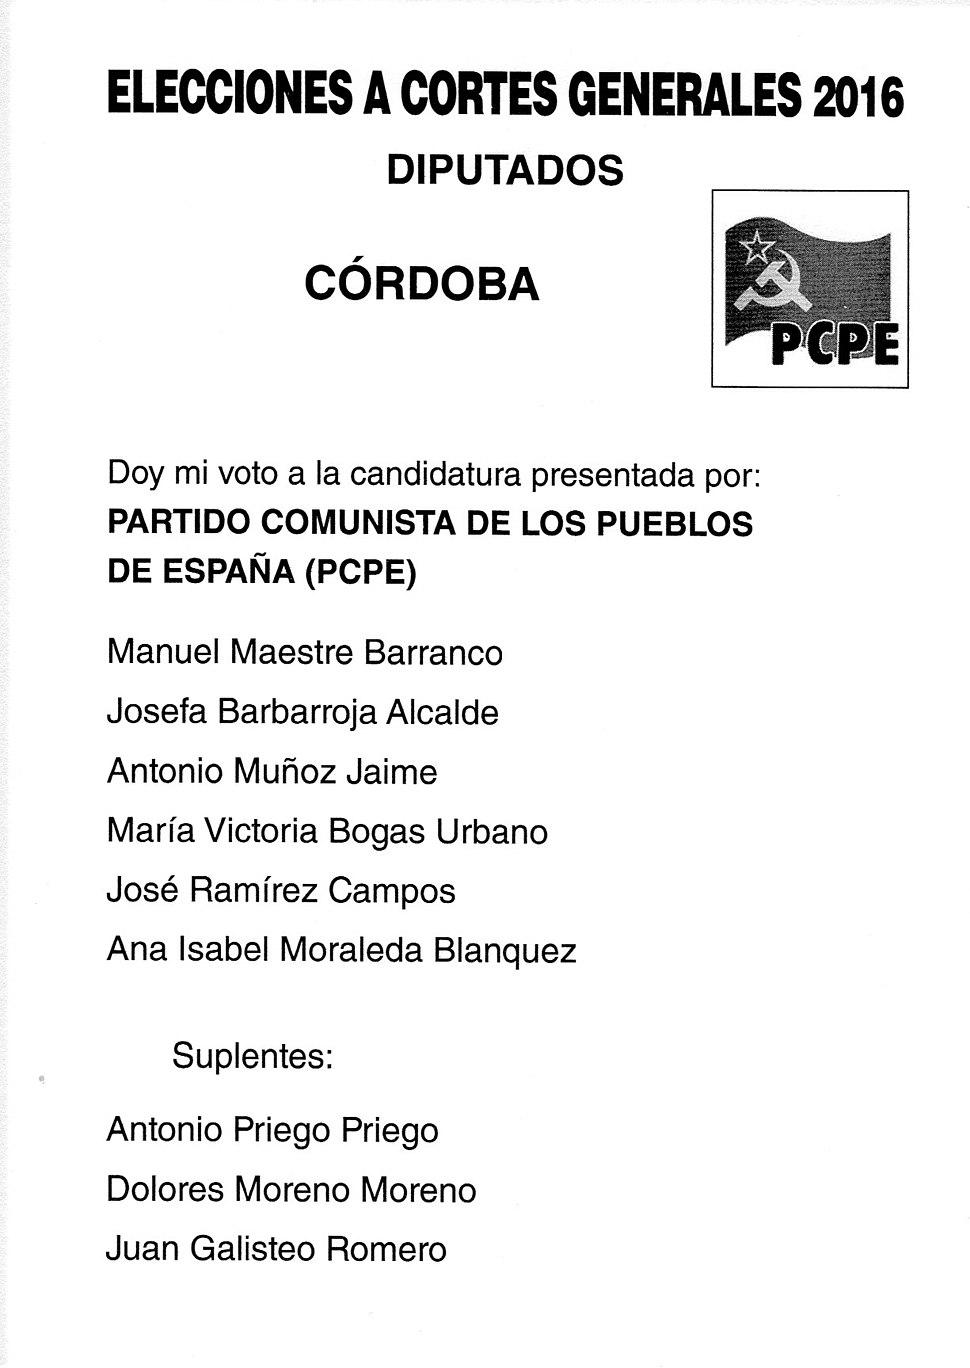 2016 Spanish General Elections Ballot - Cordoba - PCPE